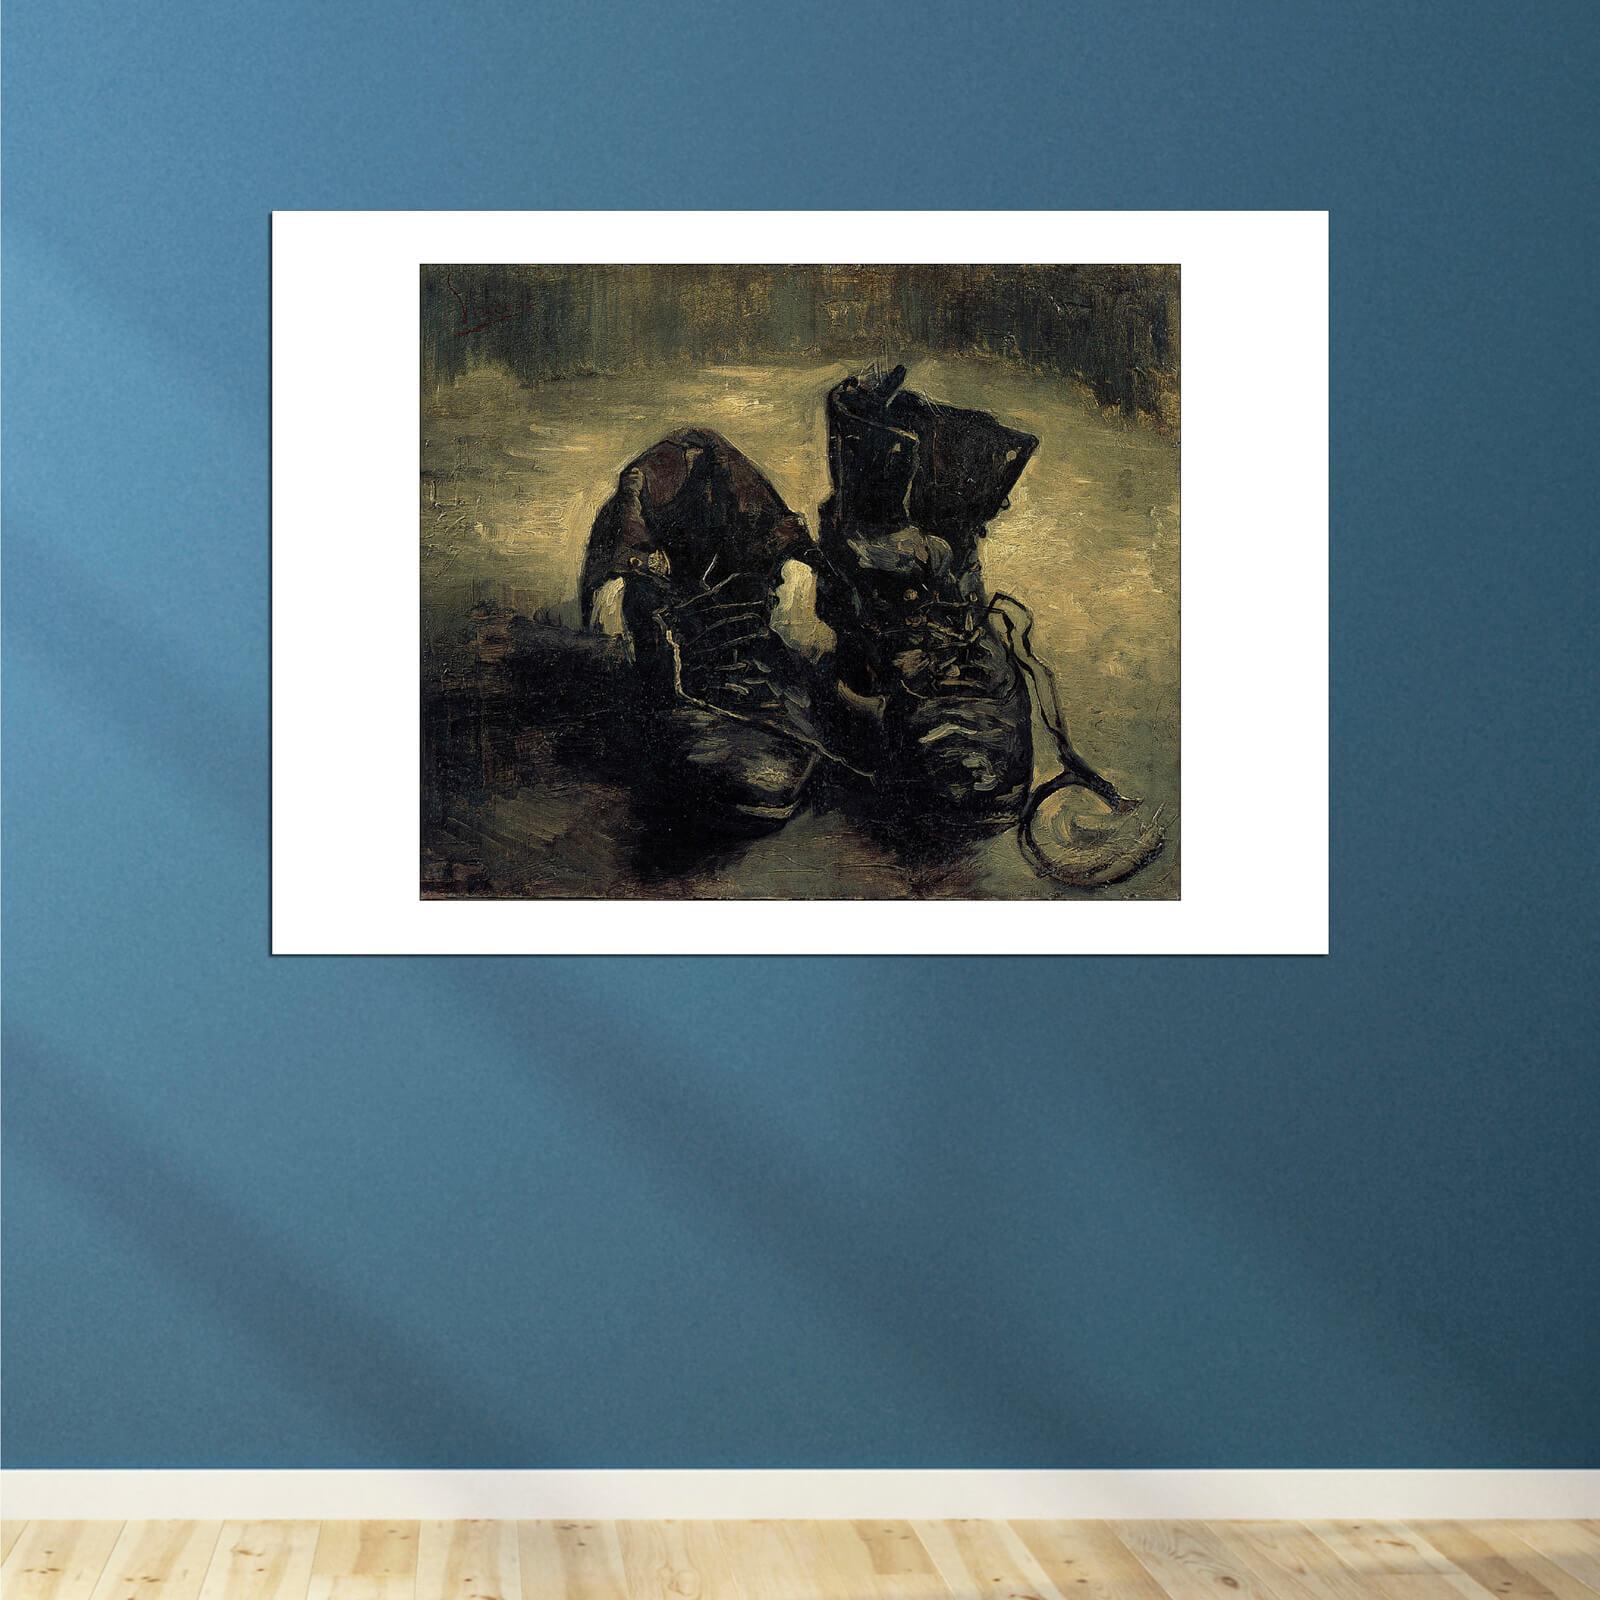 Vincent Van Gogh A Pair of Shoes 1888 Wall Art Poster Print